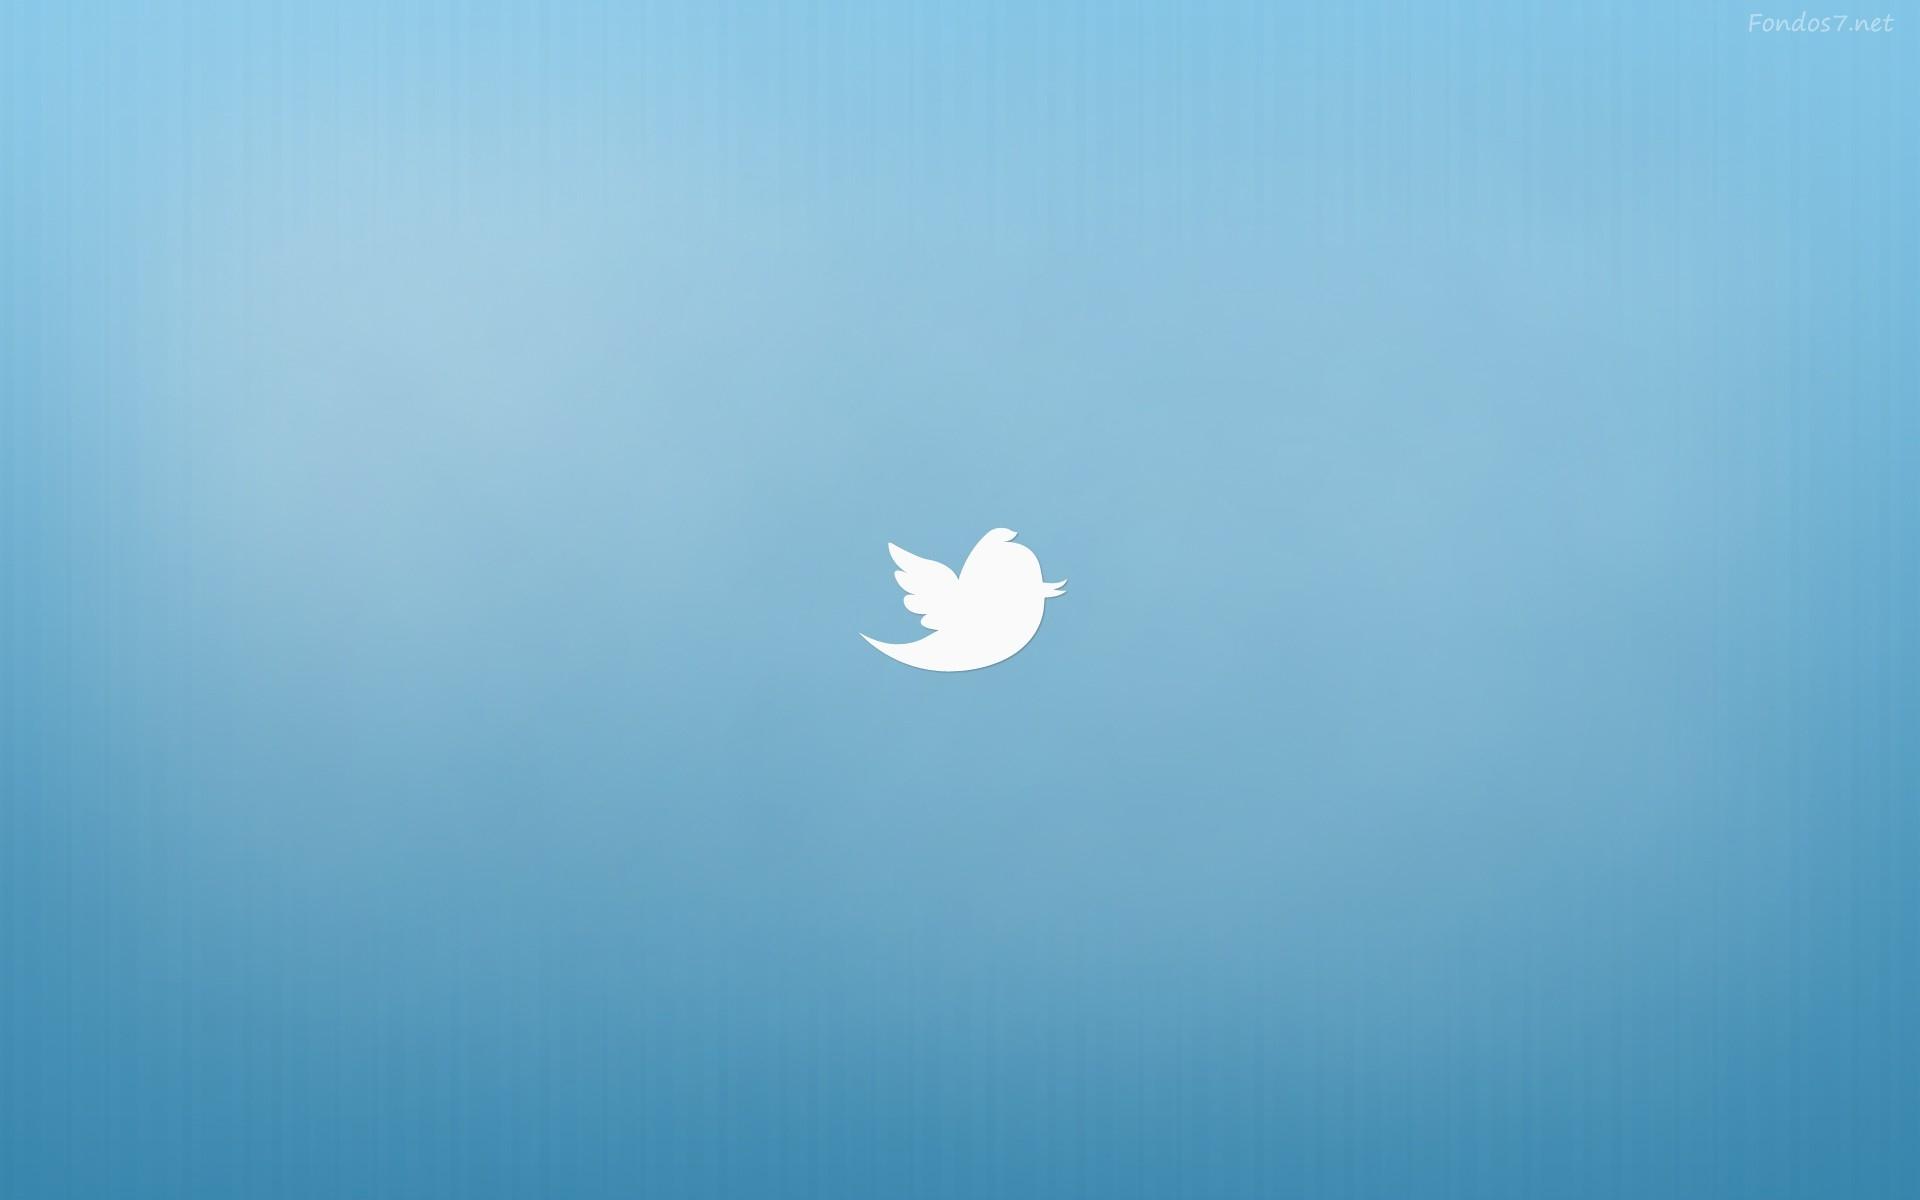 A Twitter Wallpaper - WallpaperSafari